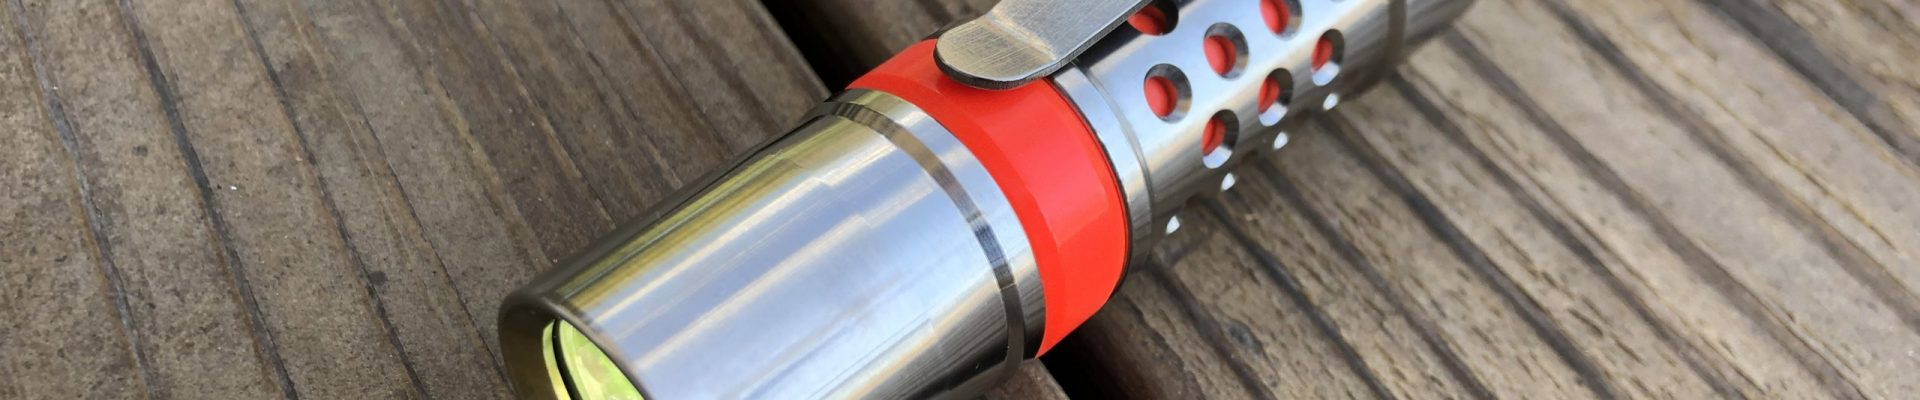 [Quick Hit] Barrel Flashlight M2JN: Form over Function